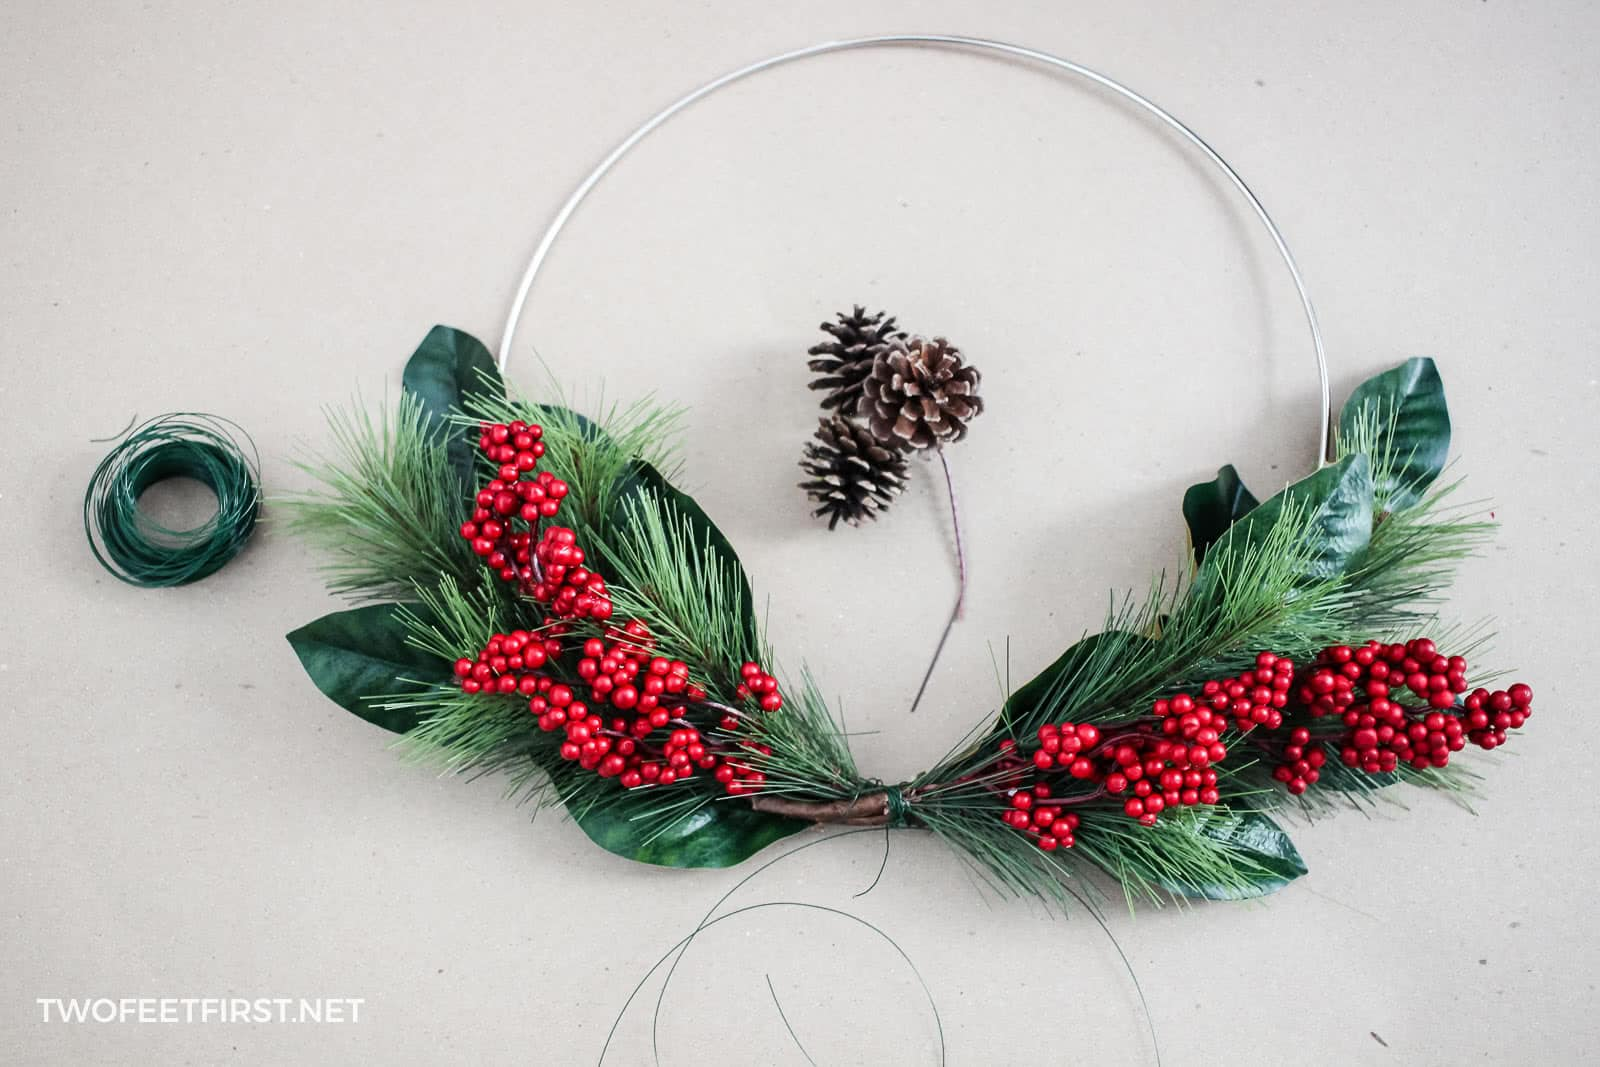 make a homemade holiday wreath